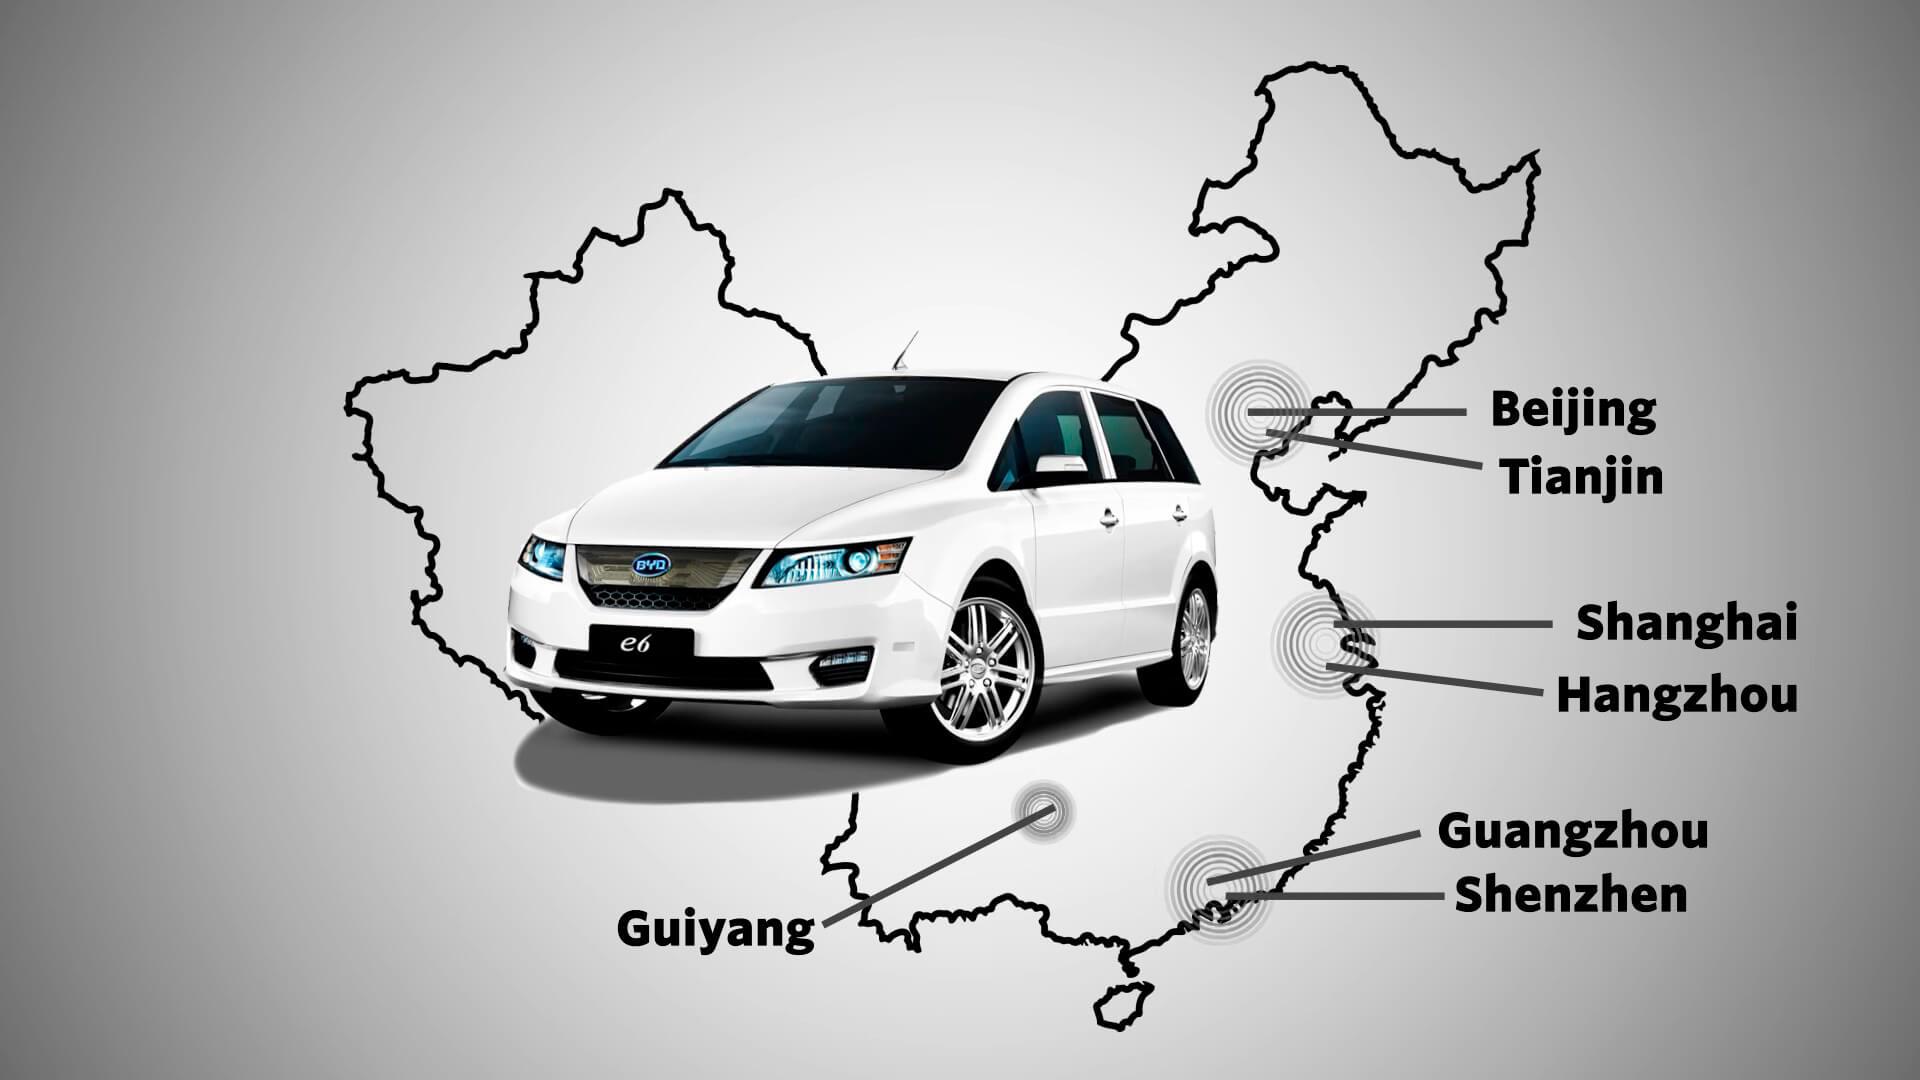 Самая продаваемая марка электромобиля в Китае — BYD